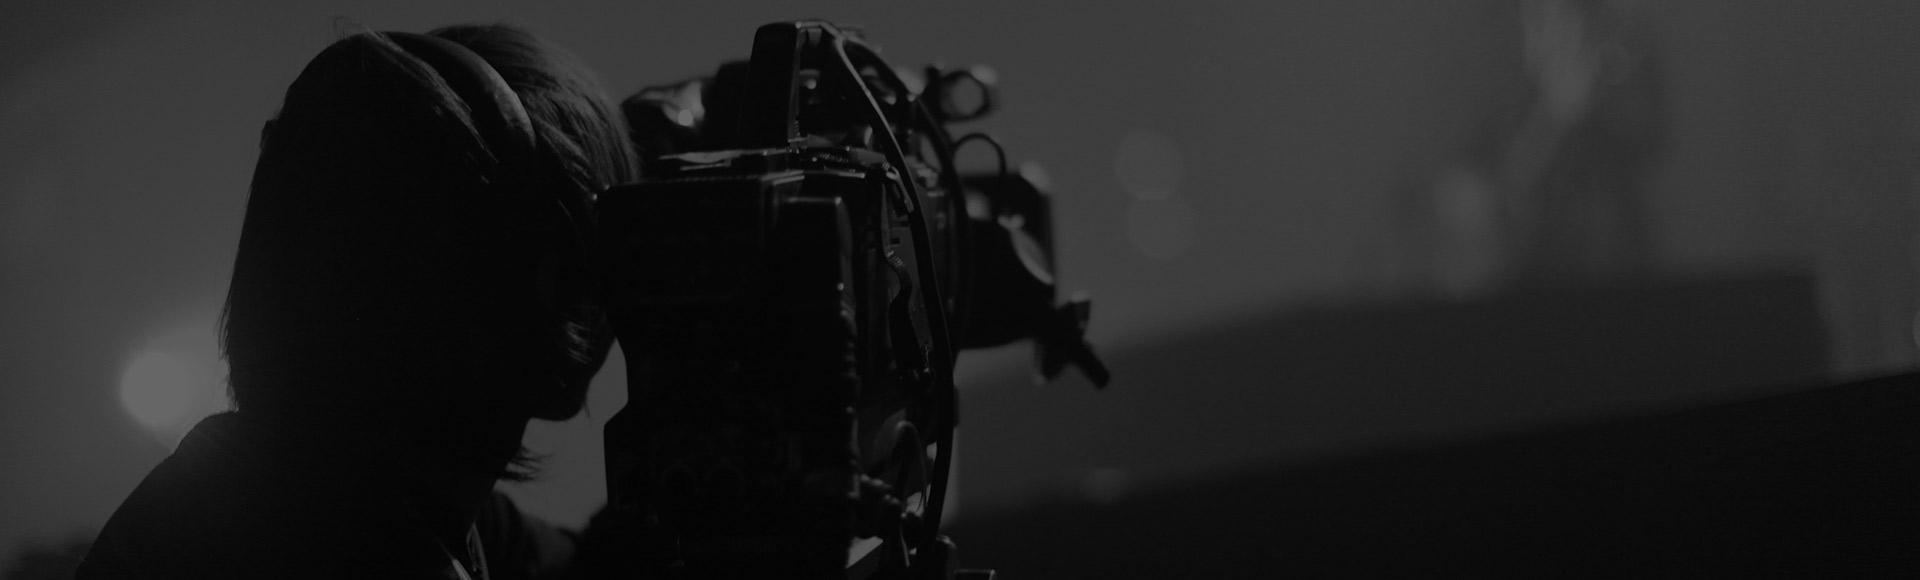 video-production---narrow.jpg